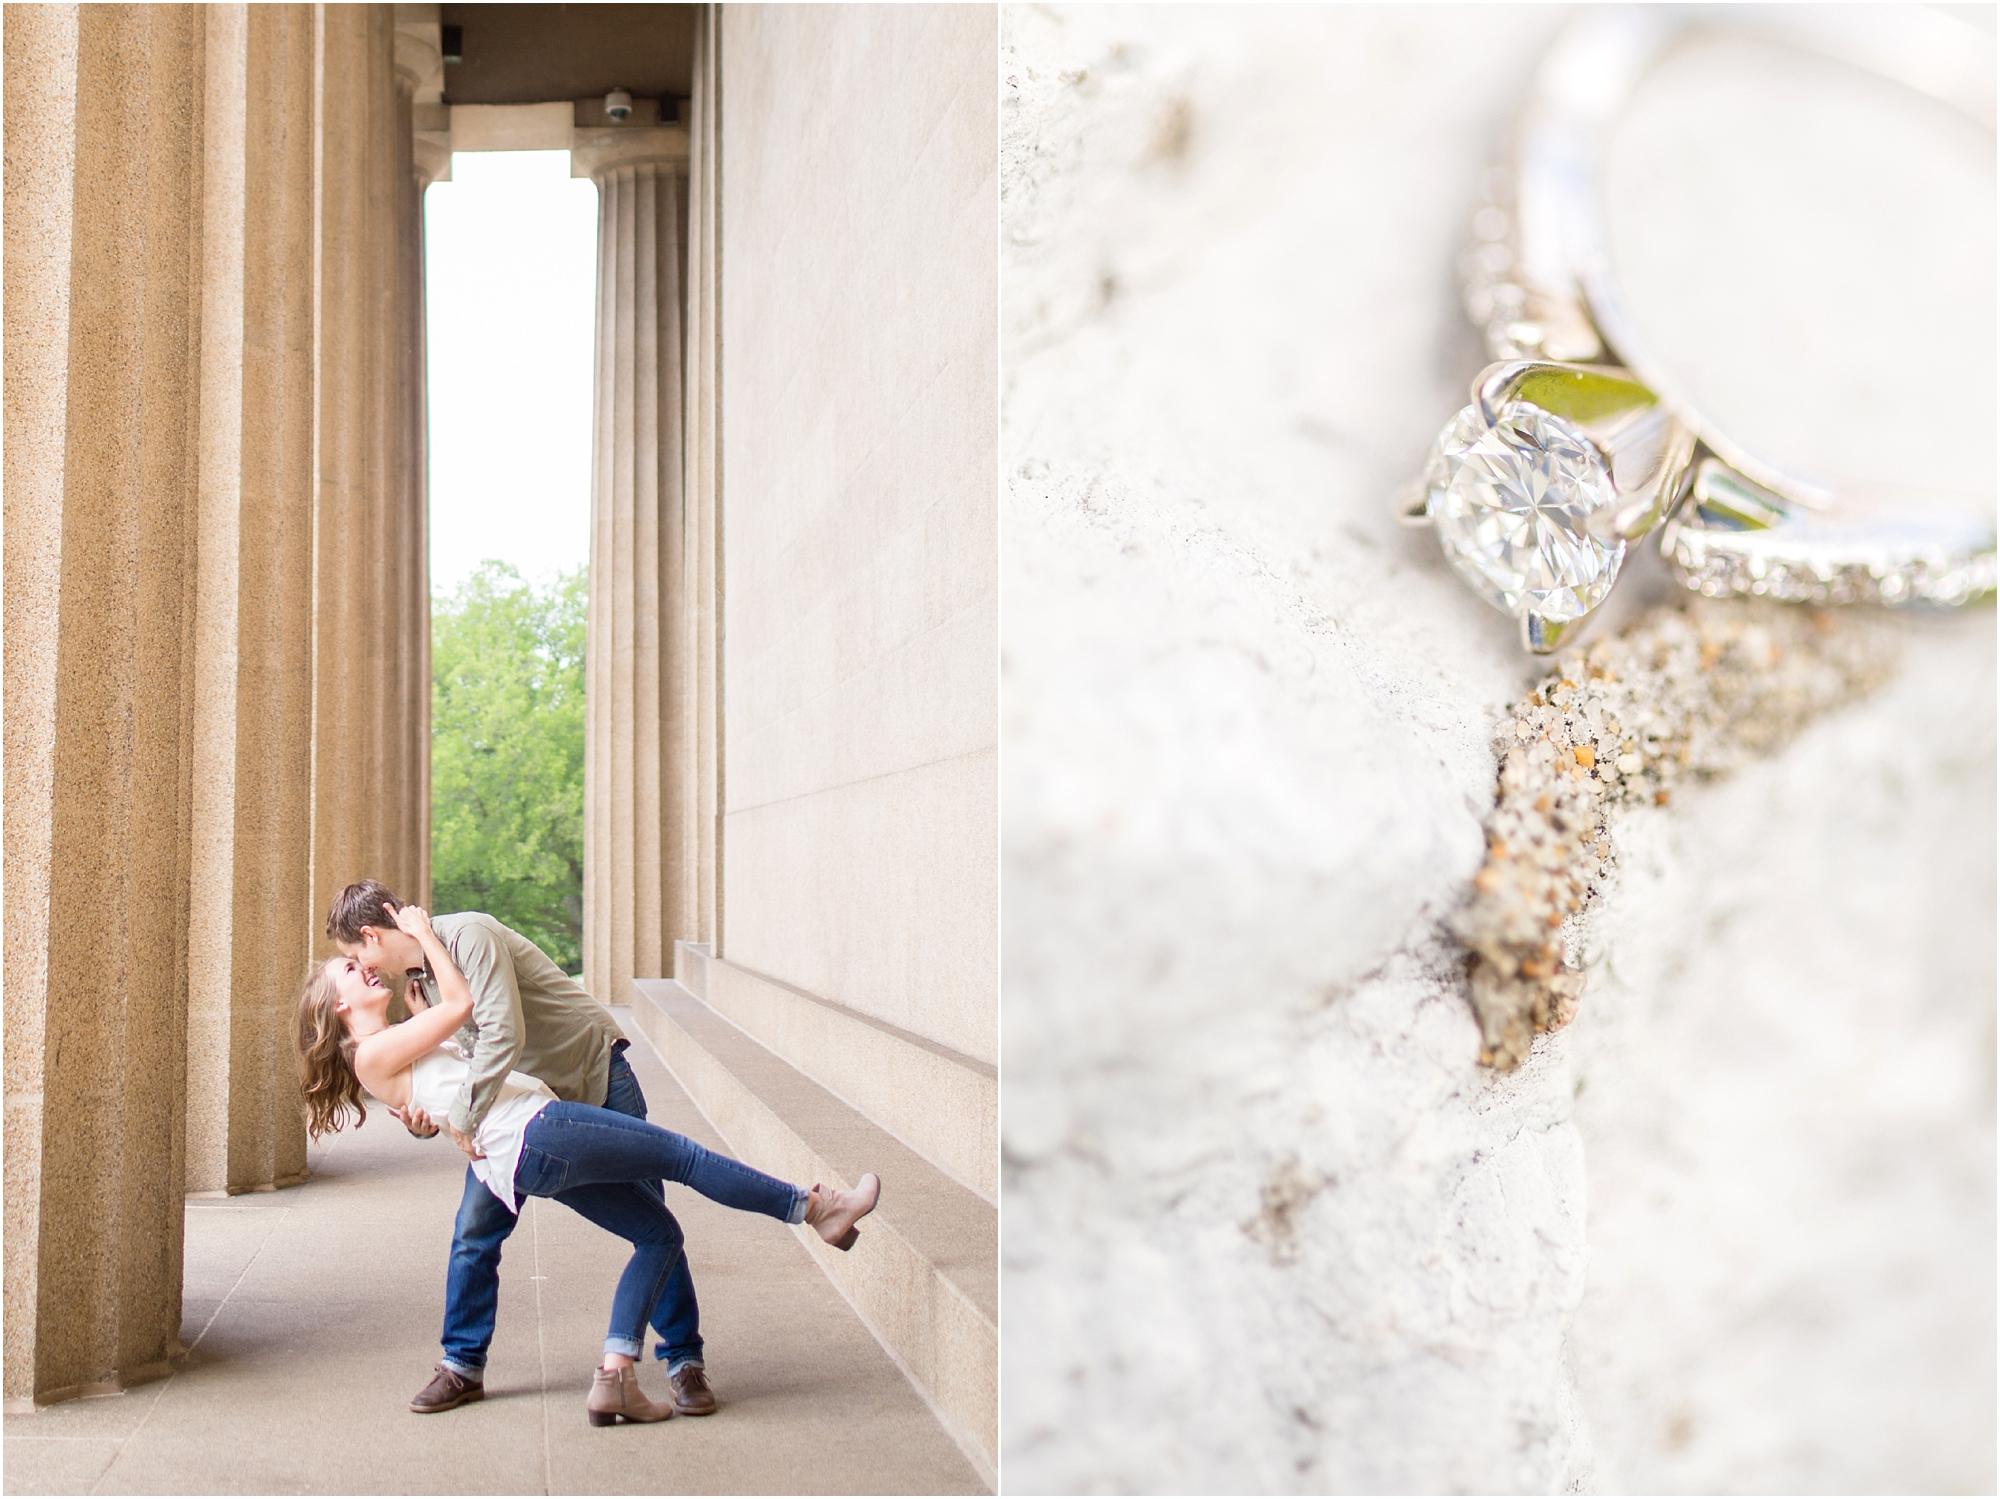 Erin & Jackson Engagement-123_anna grace photography nashville tennessee engagement photographer destination photographer photo.jpg